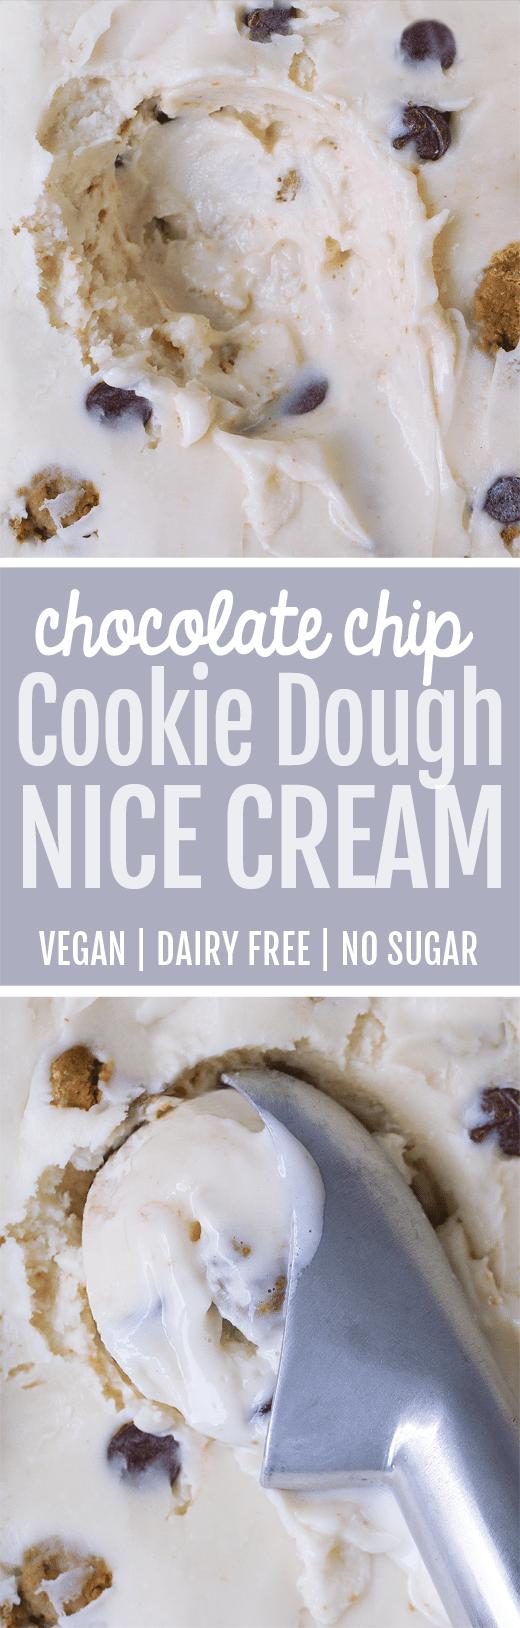 Creamy cookie dough nice cream – dairy free, vegan, & no added sugar.